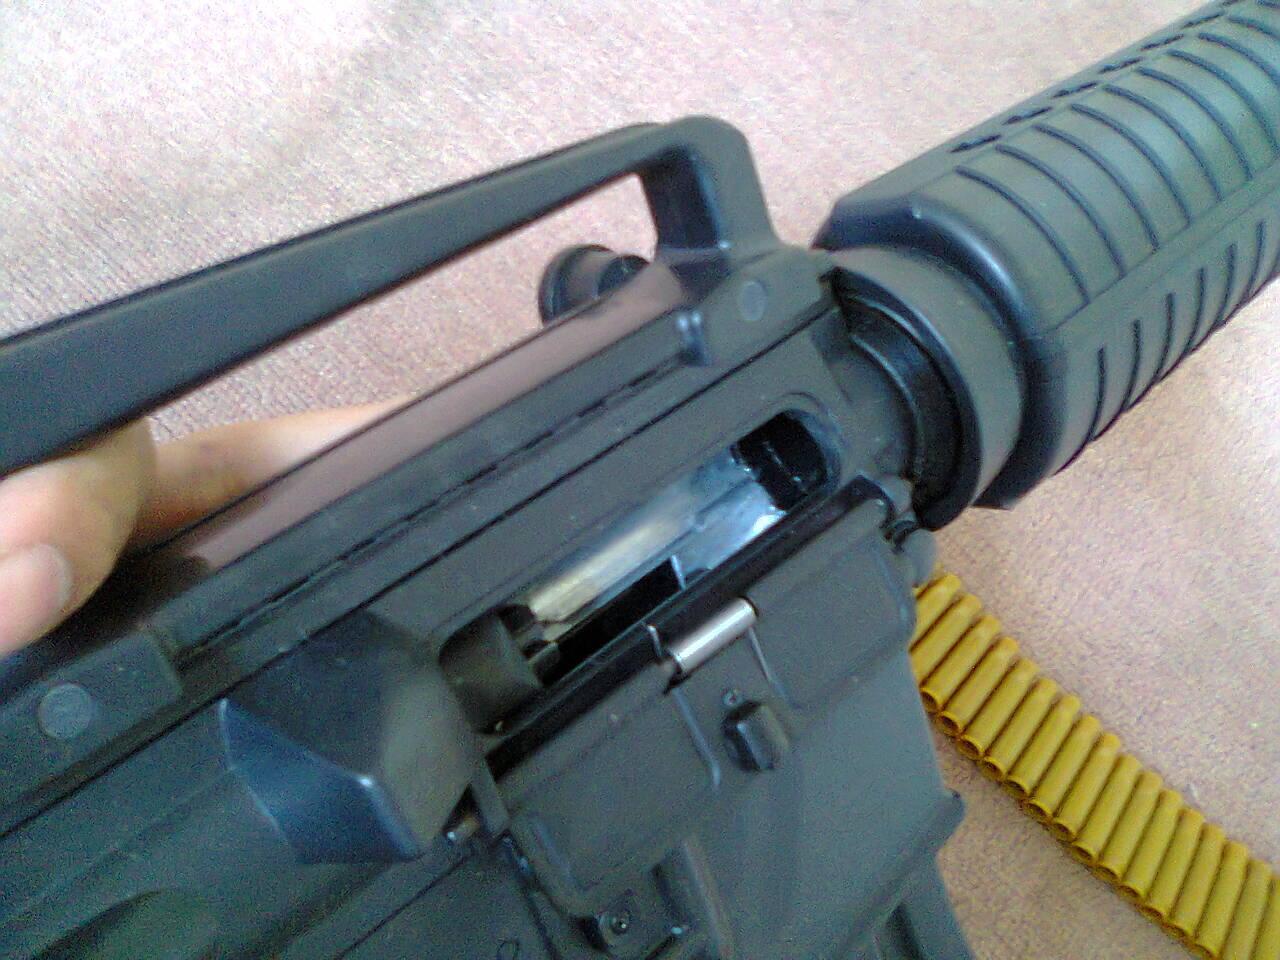 [WTS] M4 Bison Shell Ejecting Spring dan Holo Sight EOTech mulus!! masuk dulu gan..